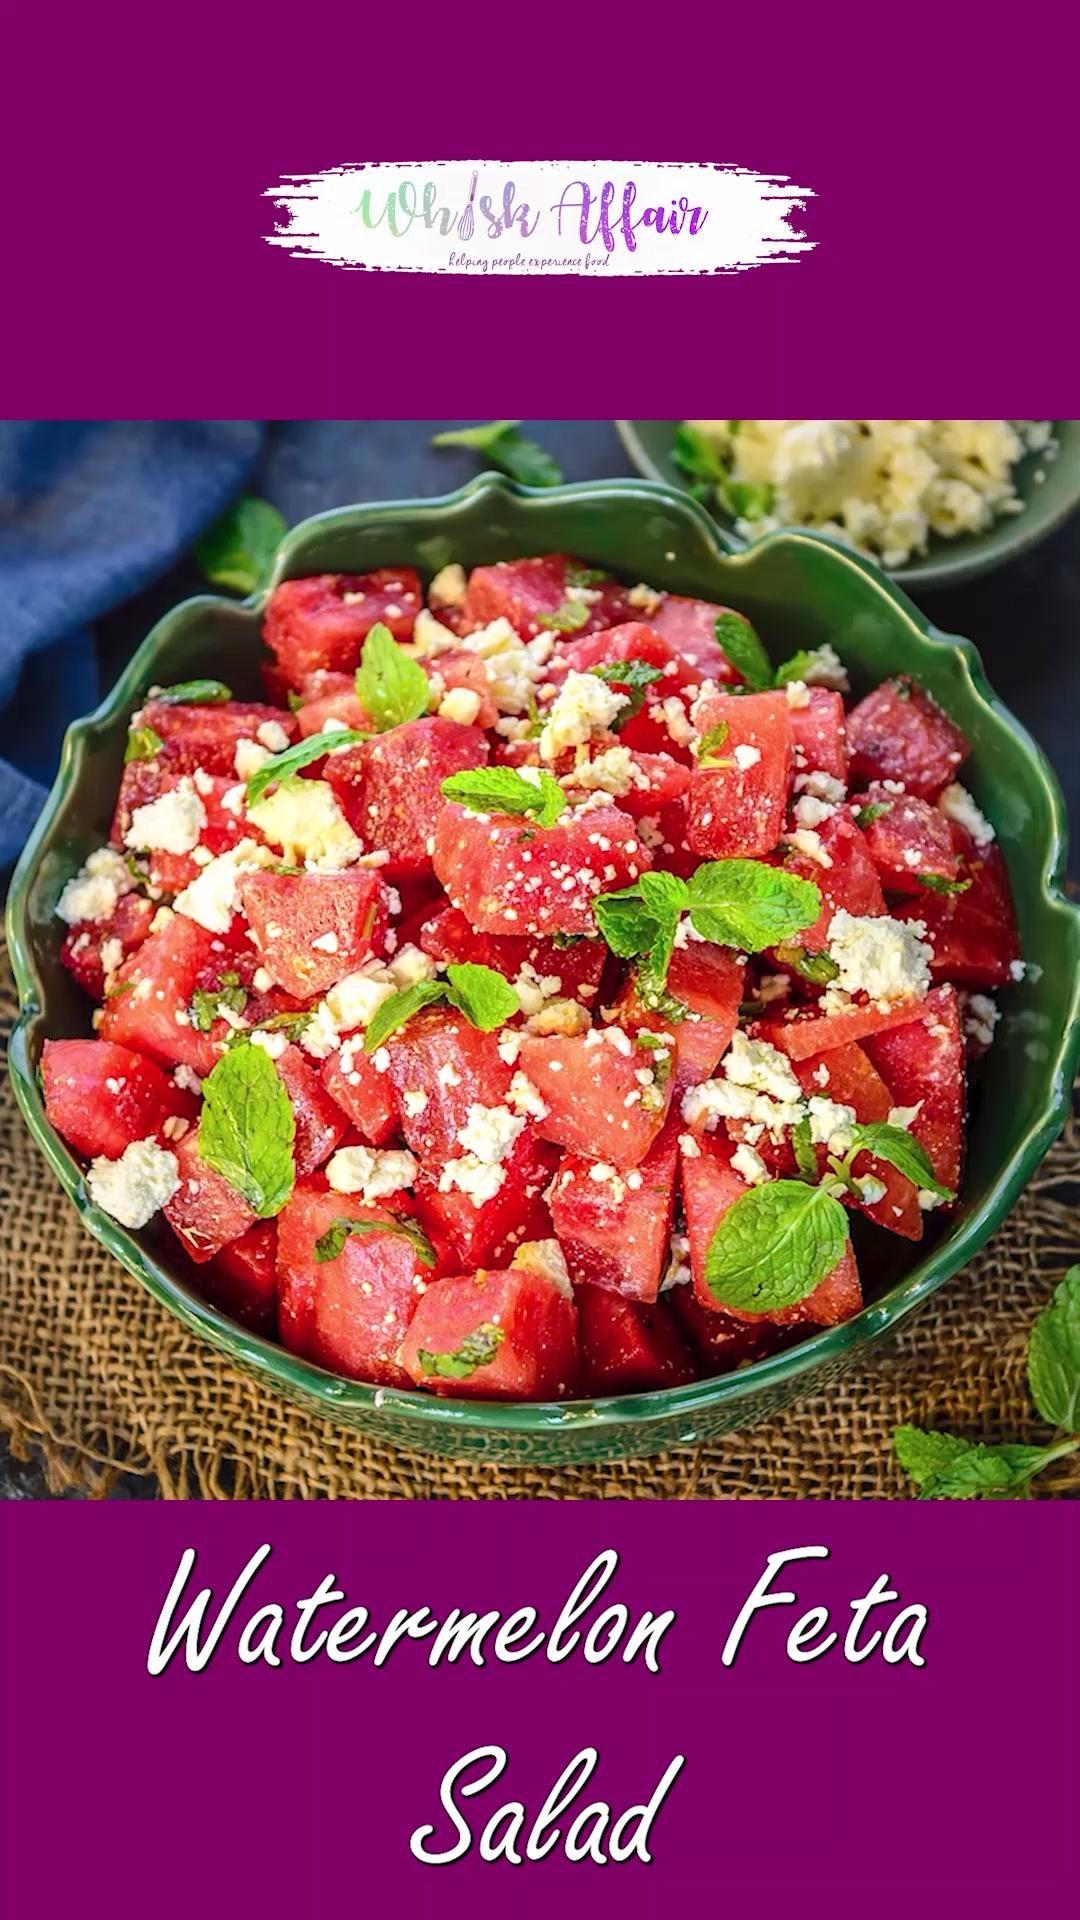 Watermelon Feta Salad Video Recipe